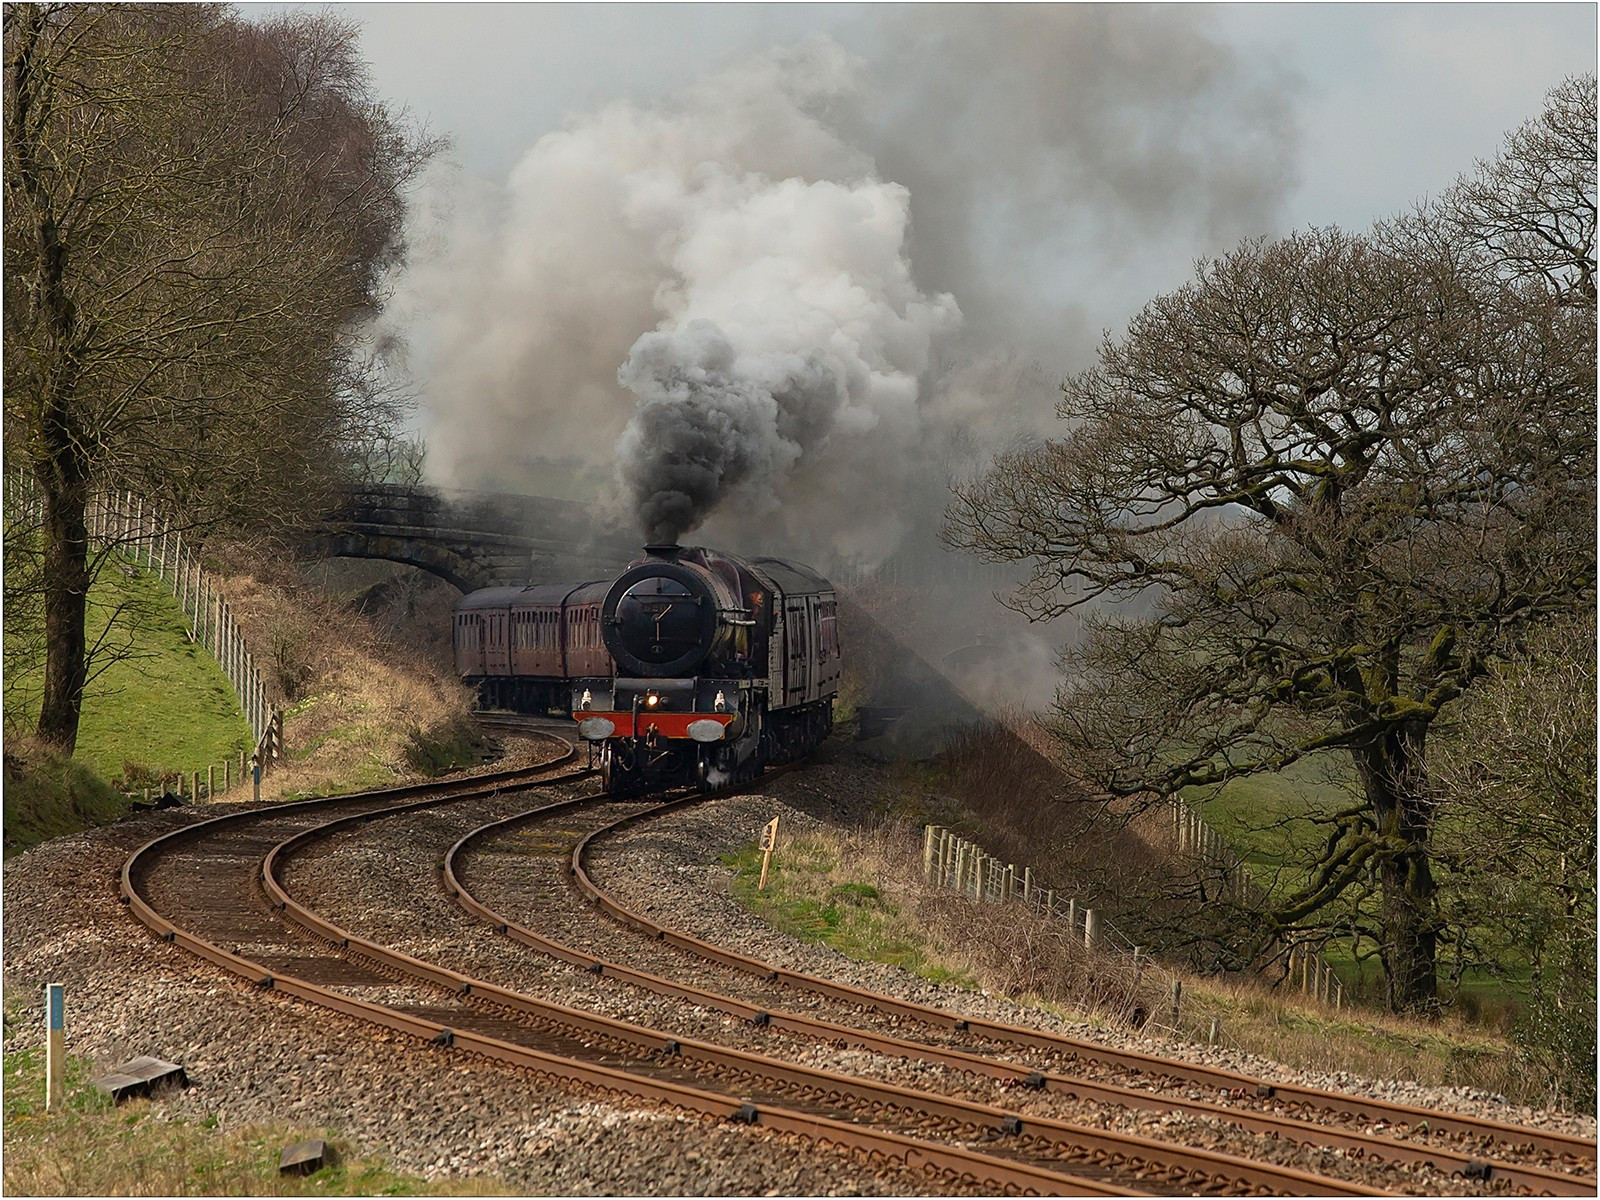 6201 Princess Elizabeth powering round the bends near Clapham